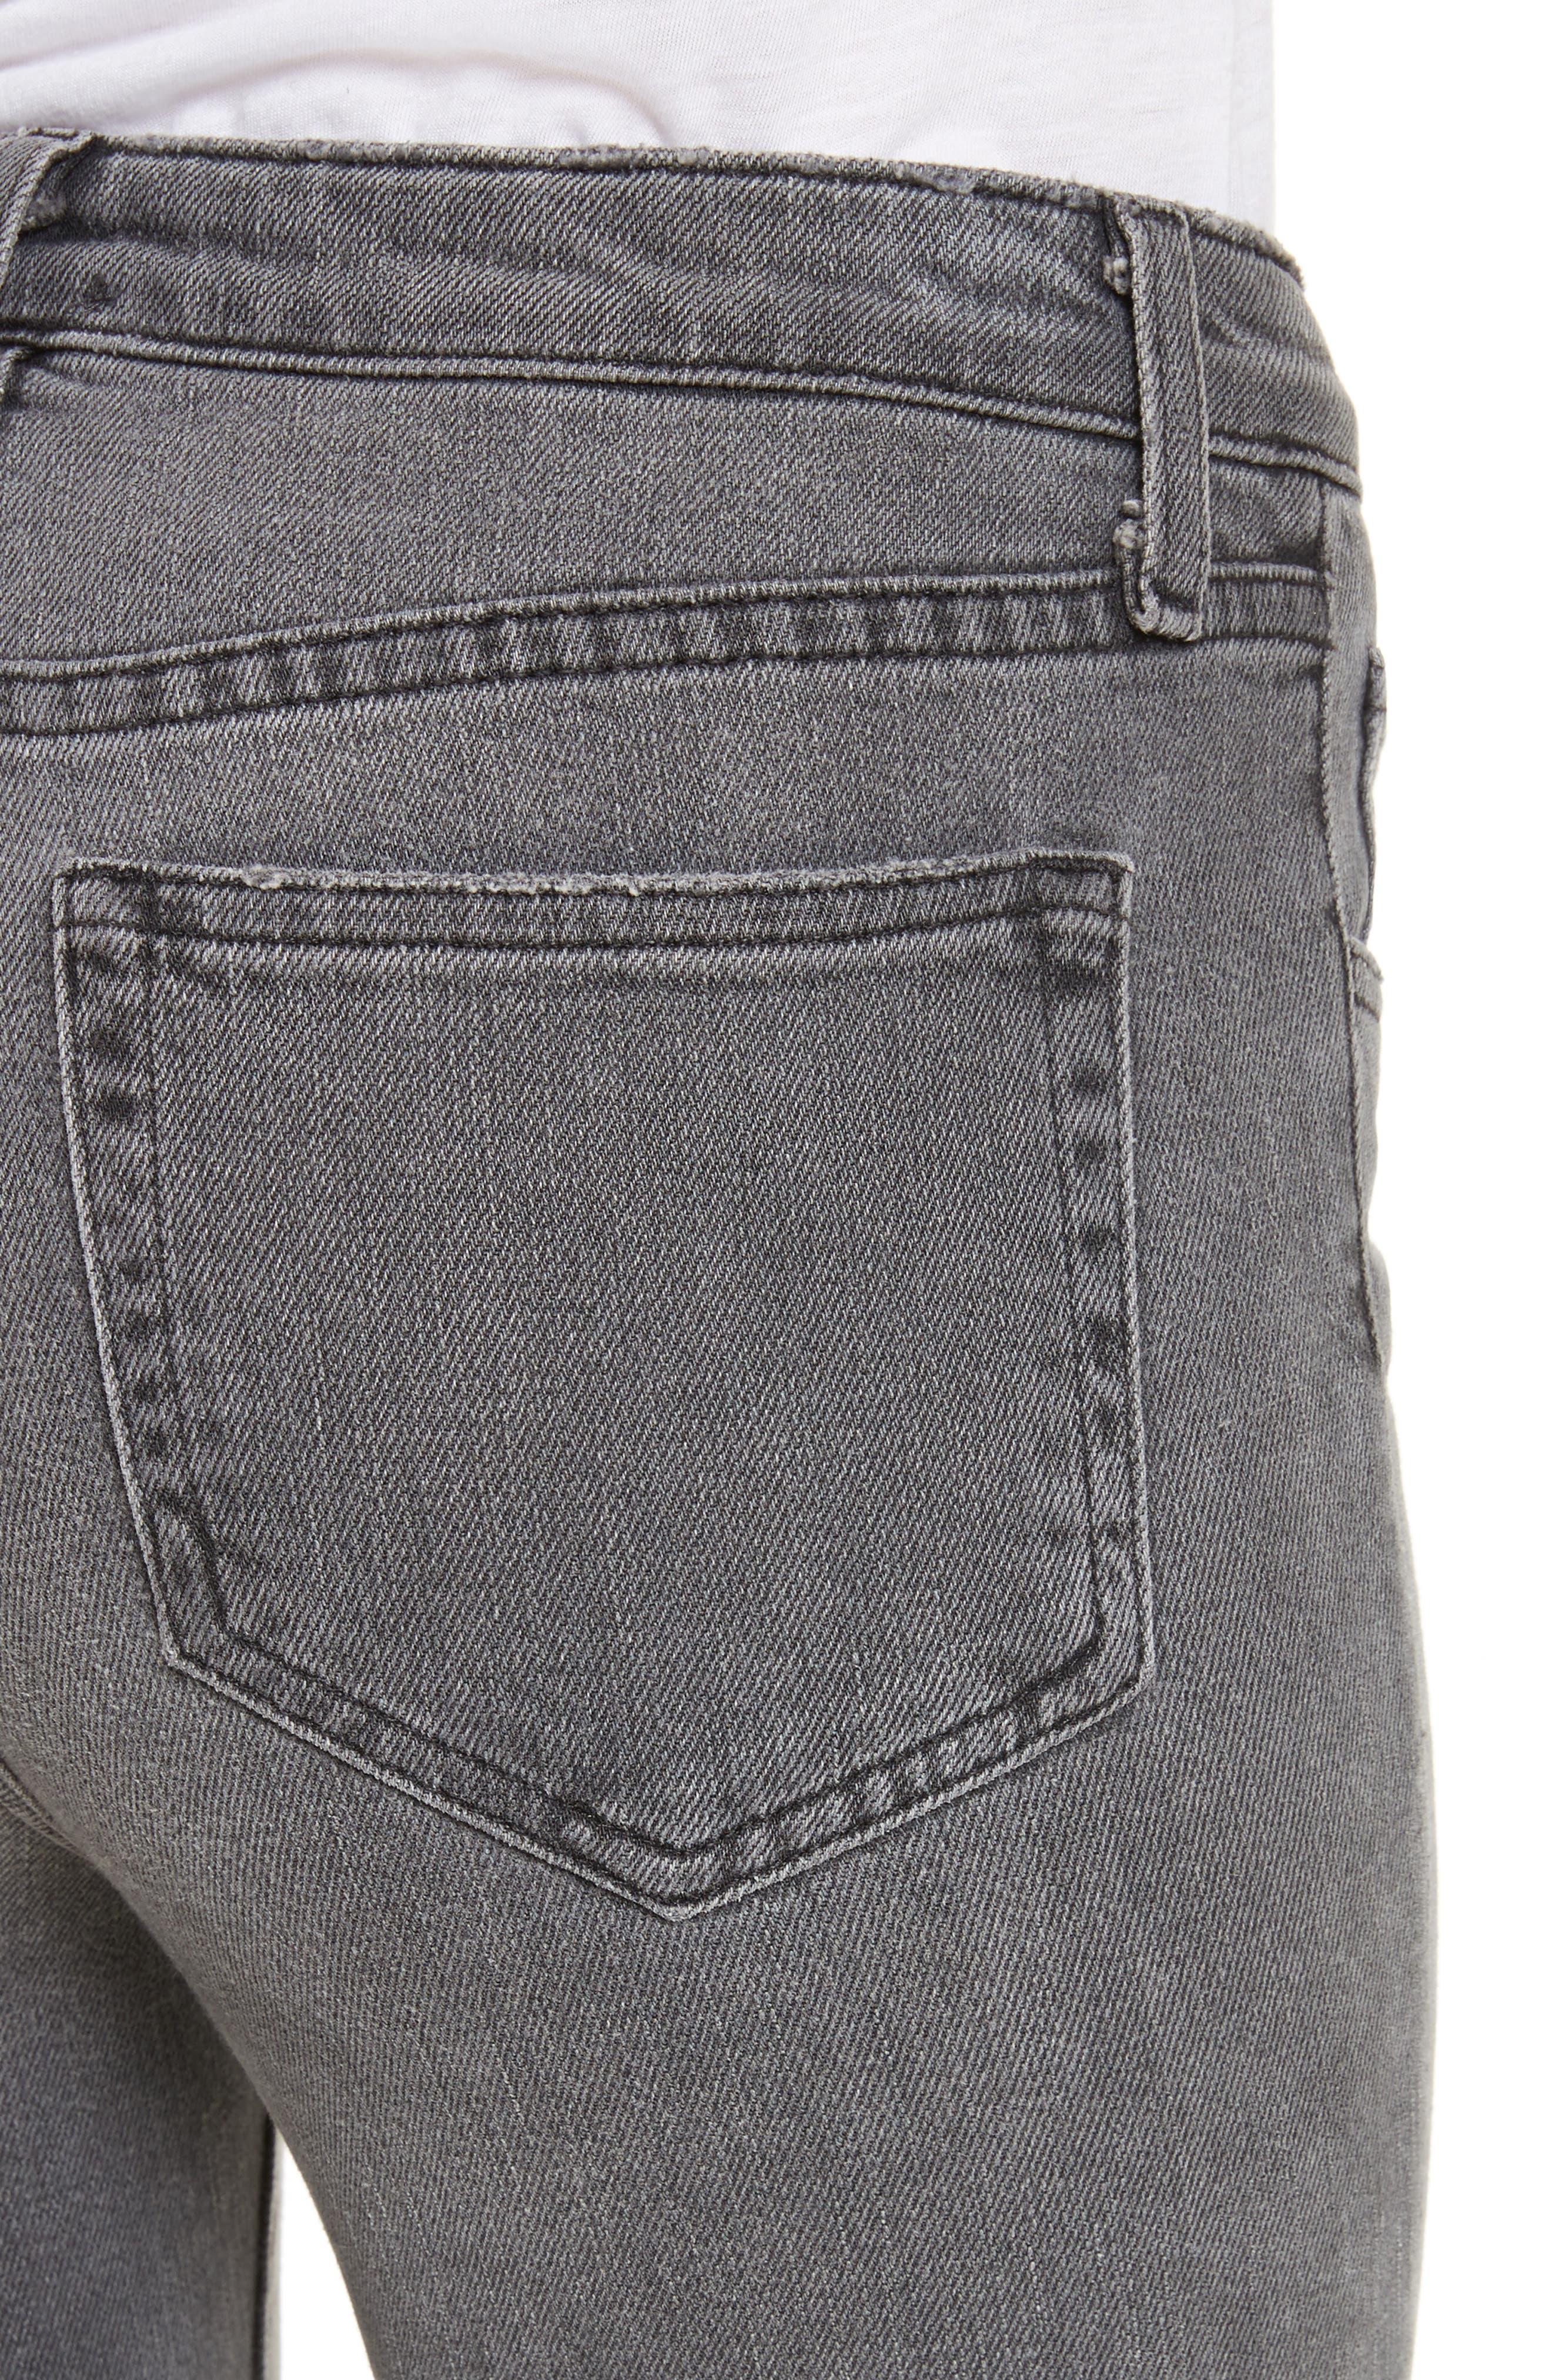 Serena High Waist Crop Flare Jeans,                             Alternate thumbnail 4, color,